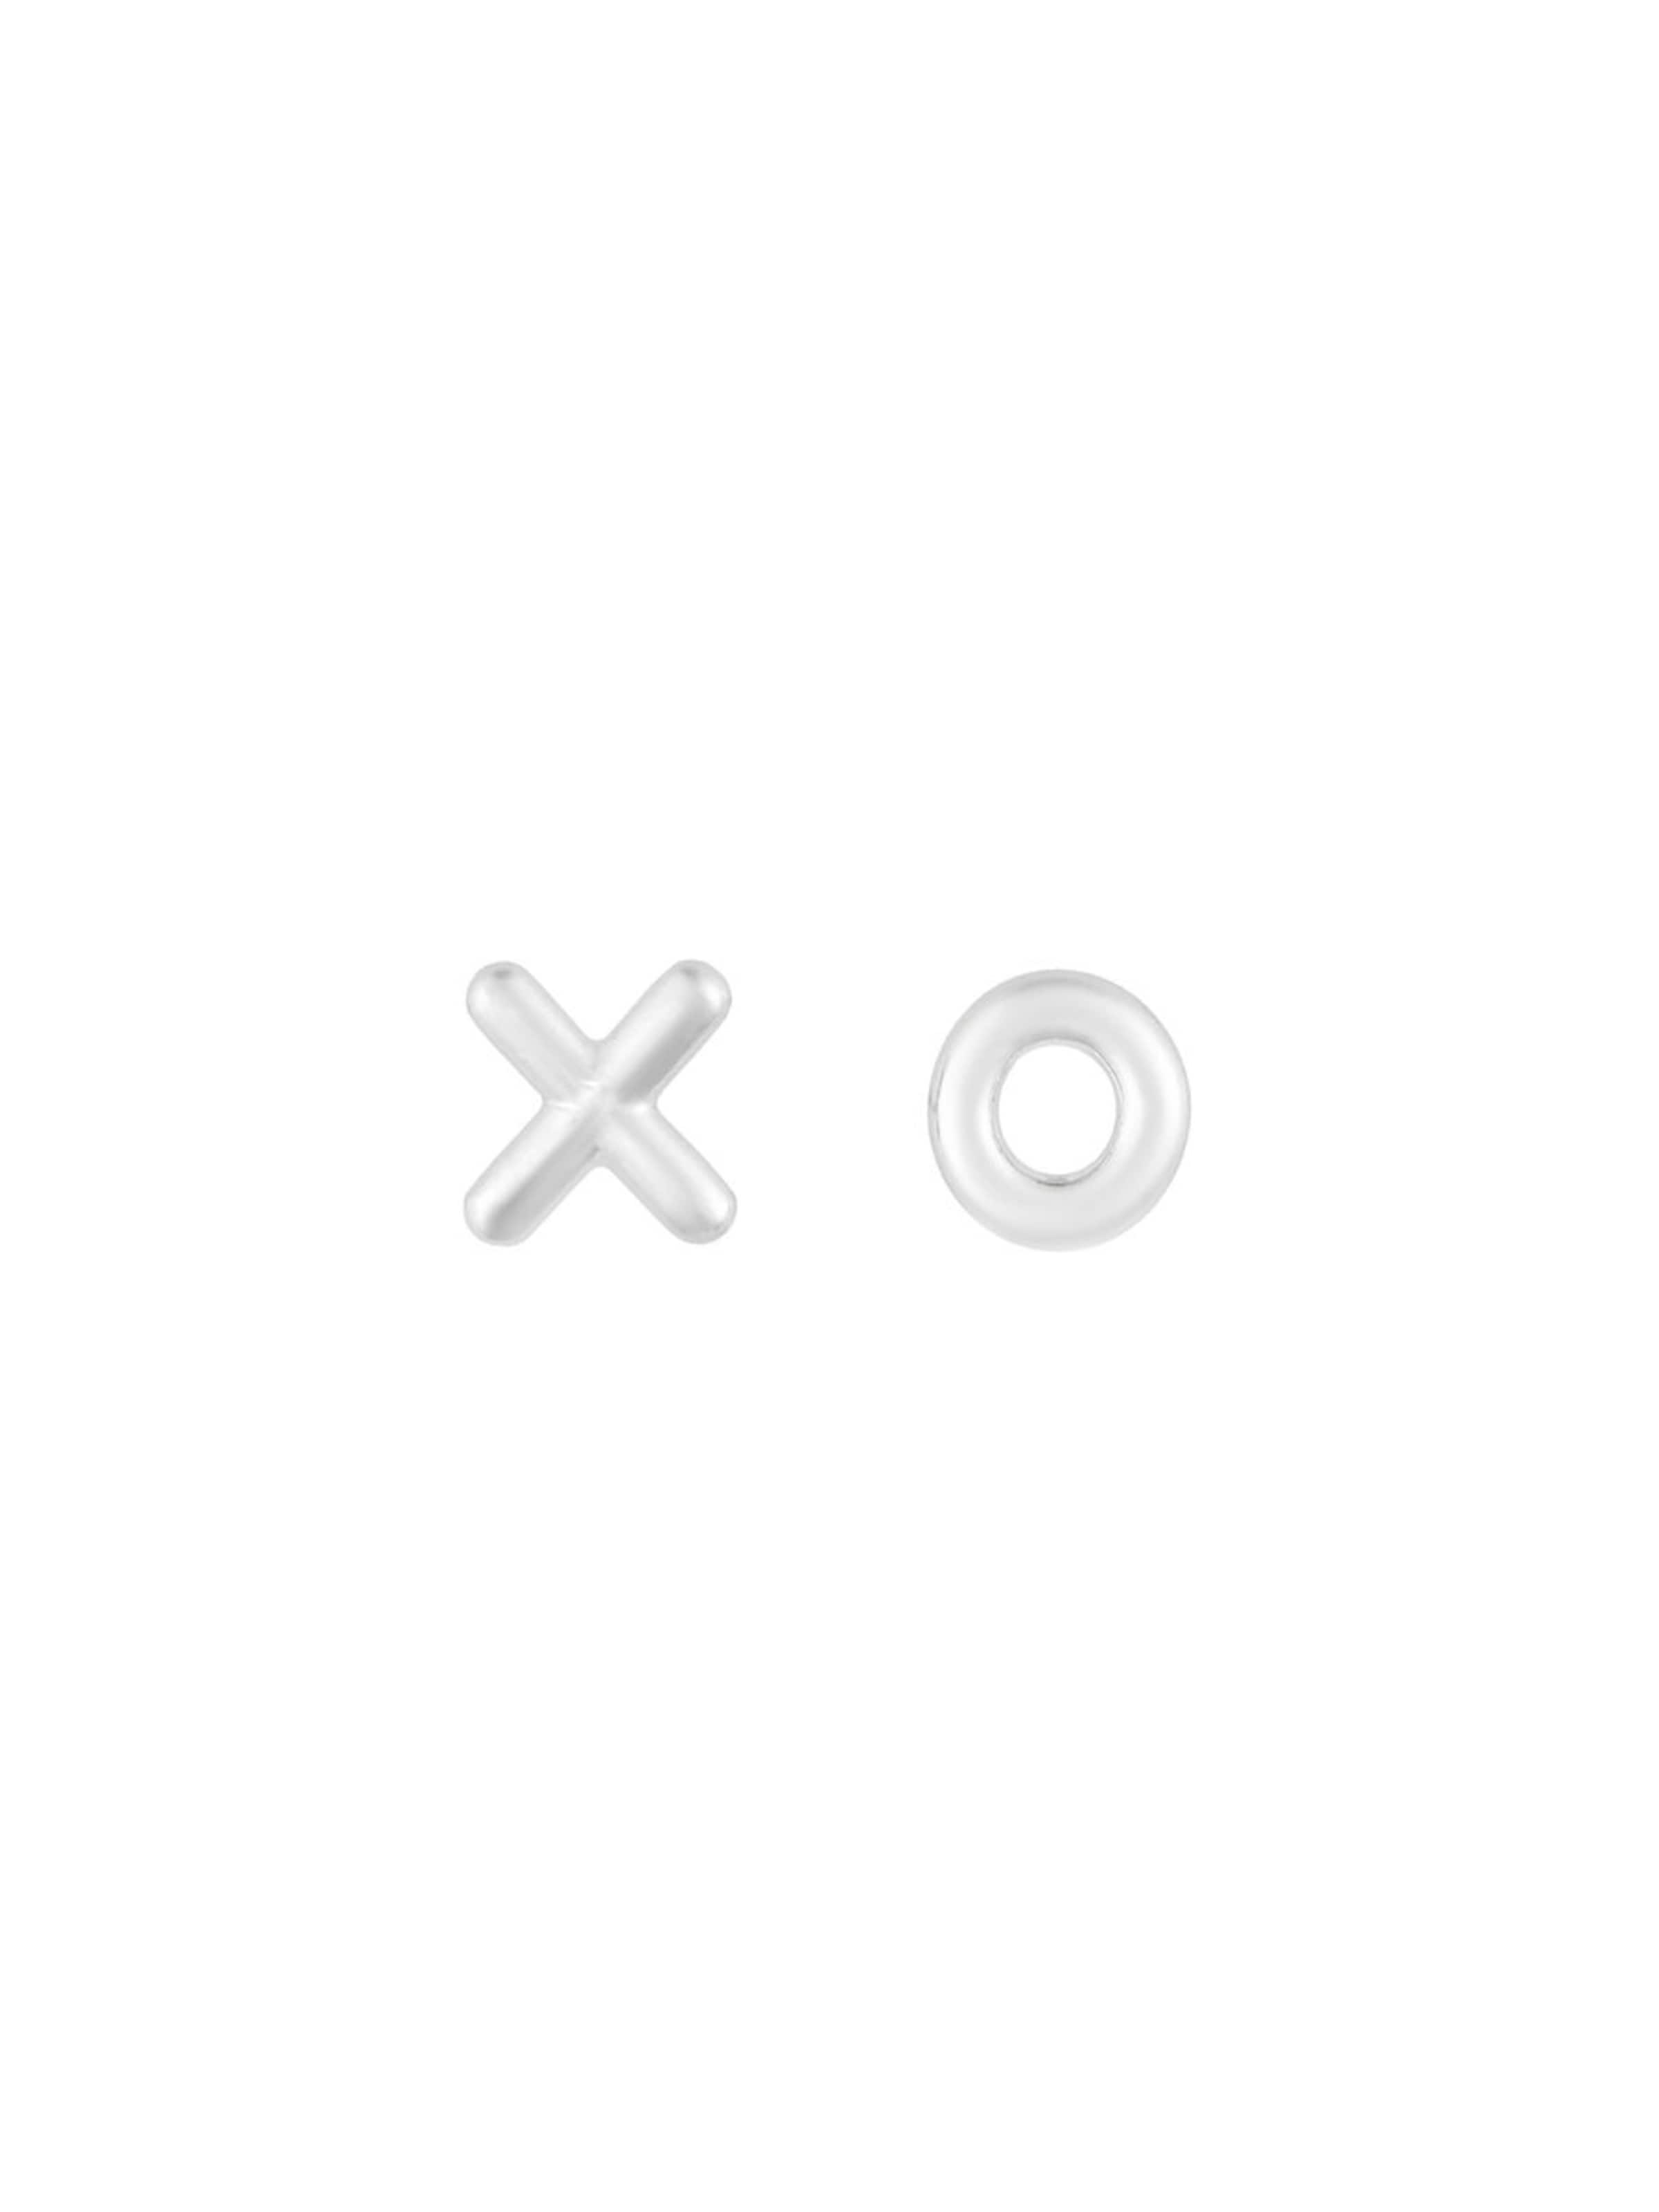 Günstig Kaufen Outlet Freies Verschiffen Zuverlässig ID Fine XO Ohrstecker O3c6nRE8a2